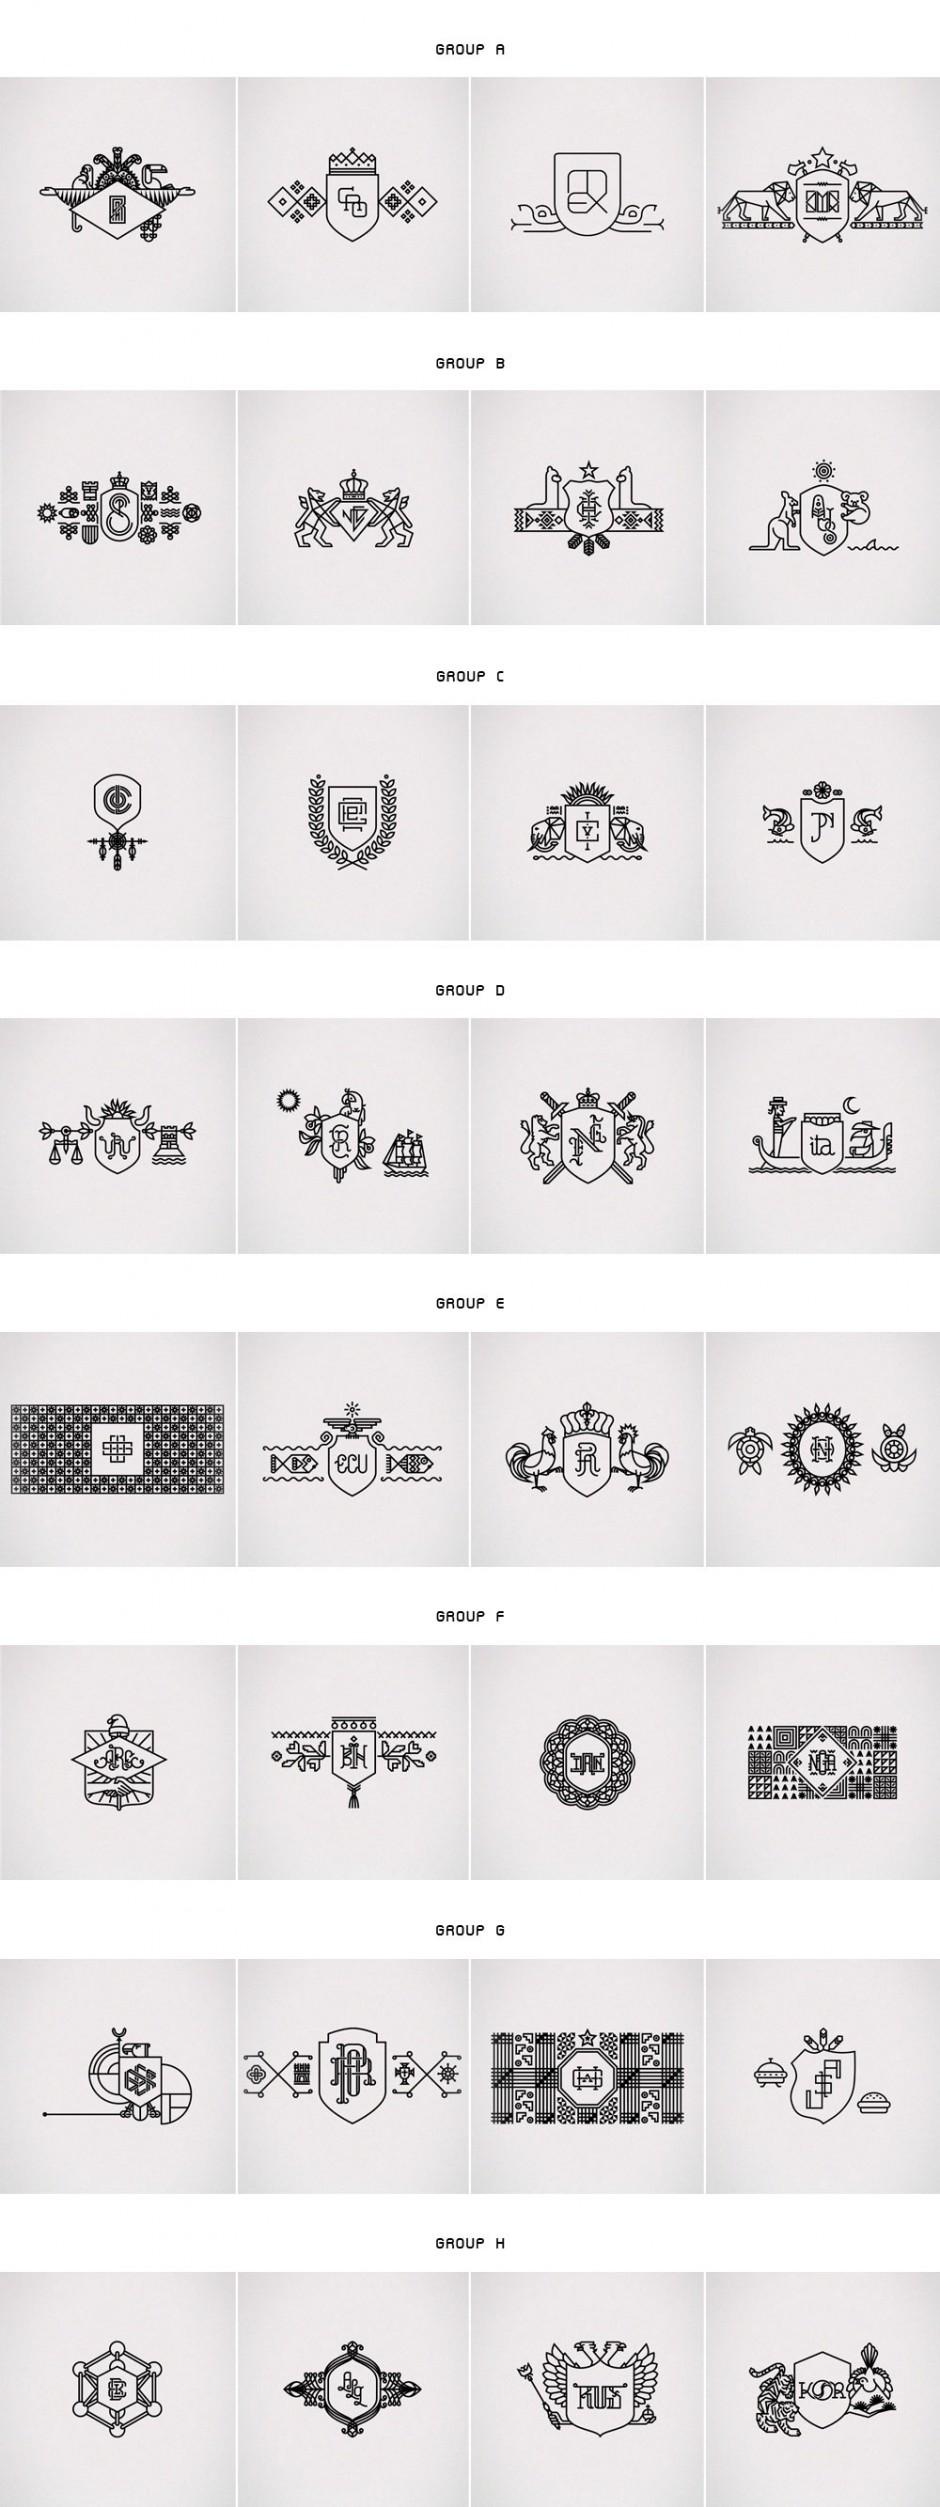 Alle Logos